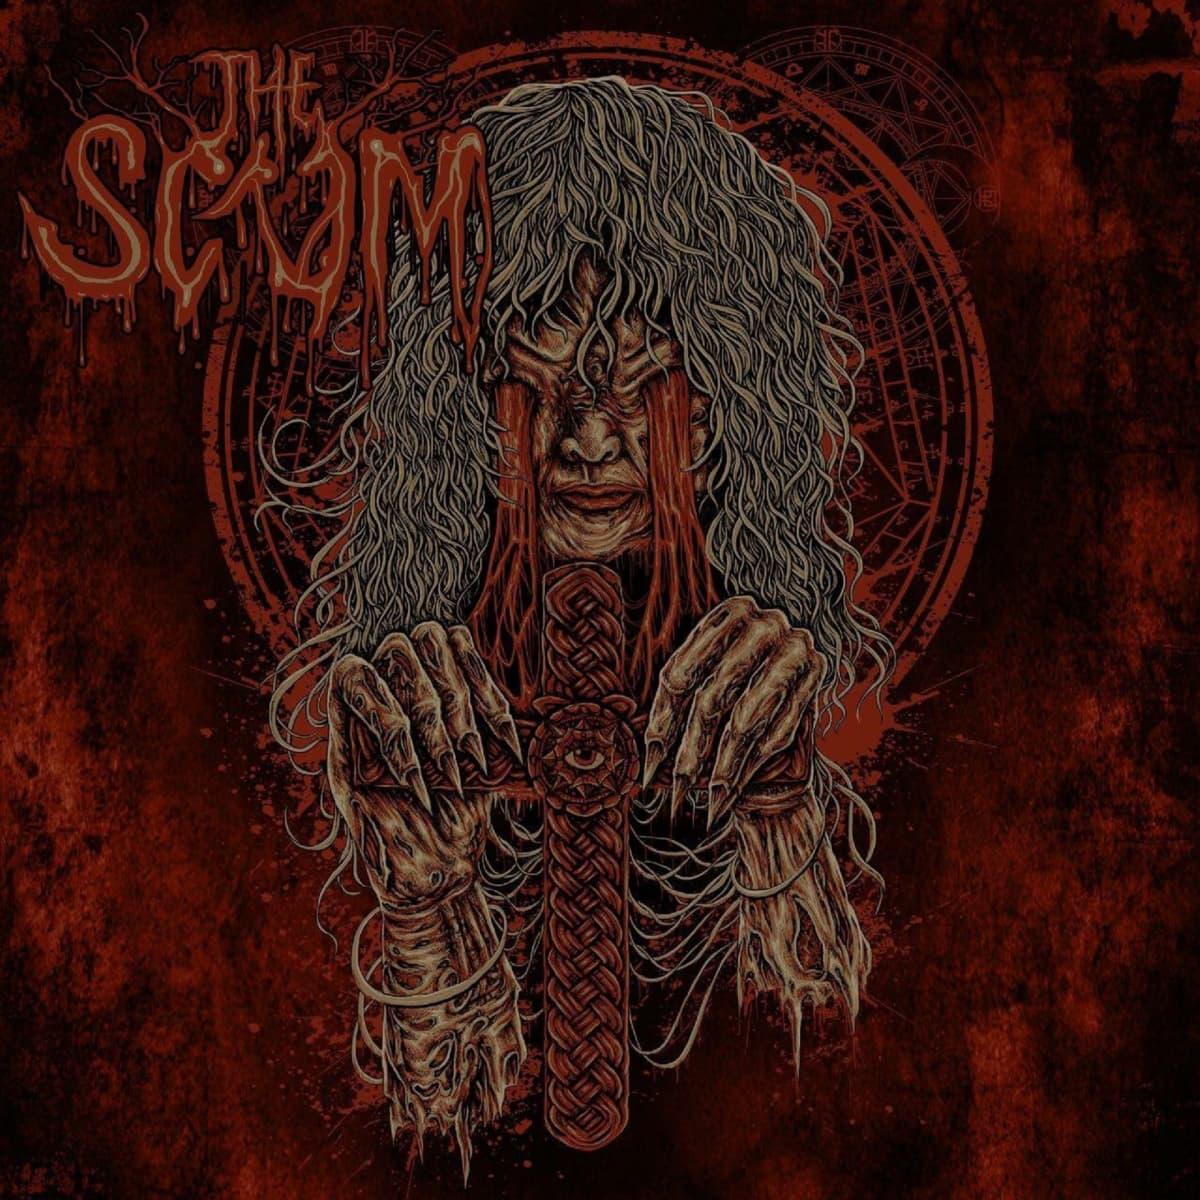 Yan Sek, death metal, The Scum